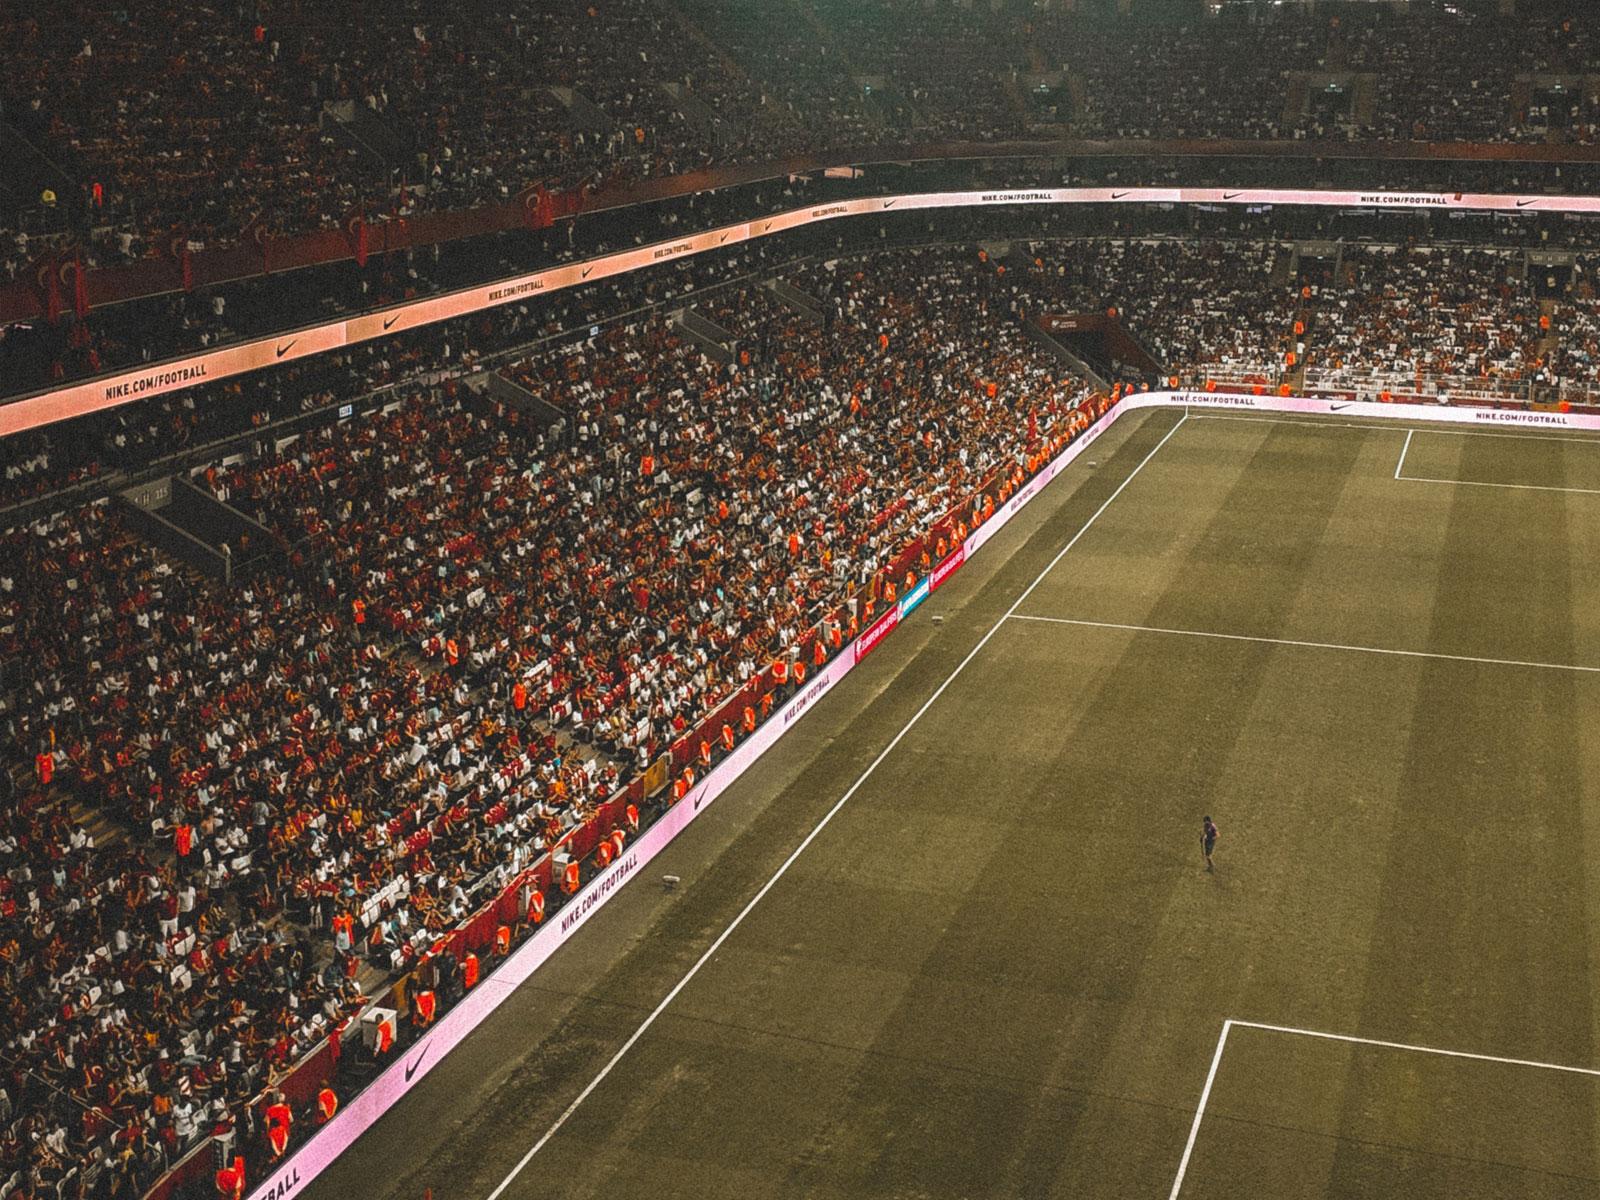 ESL: Nothing like as innovative as football needs